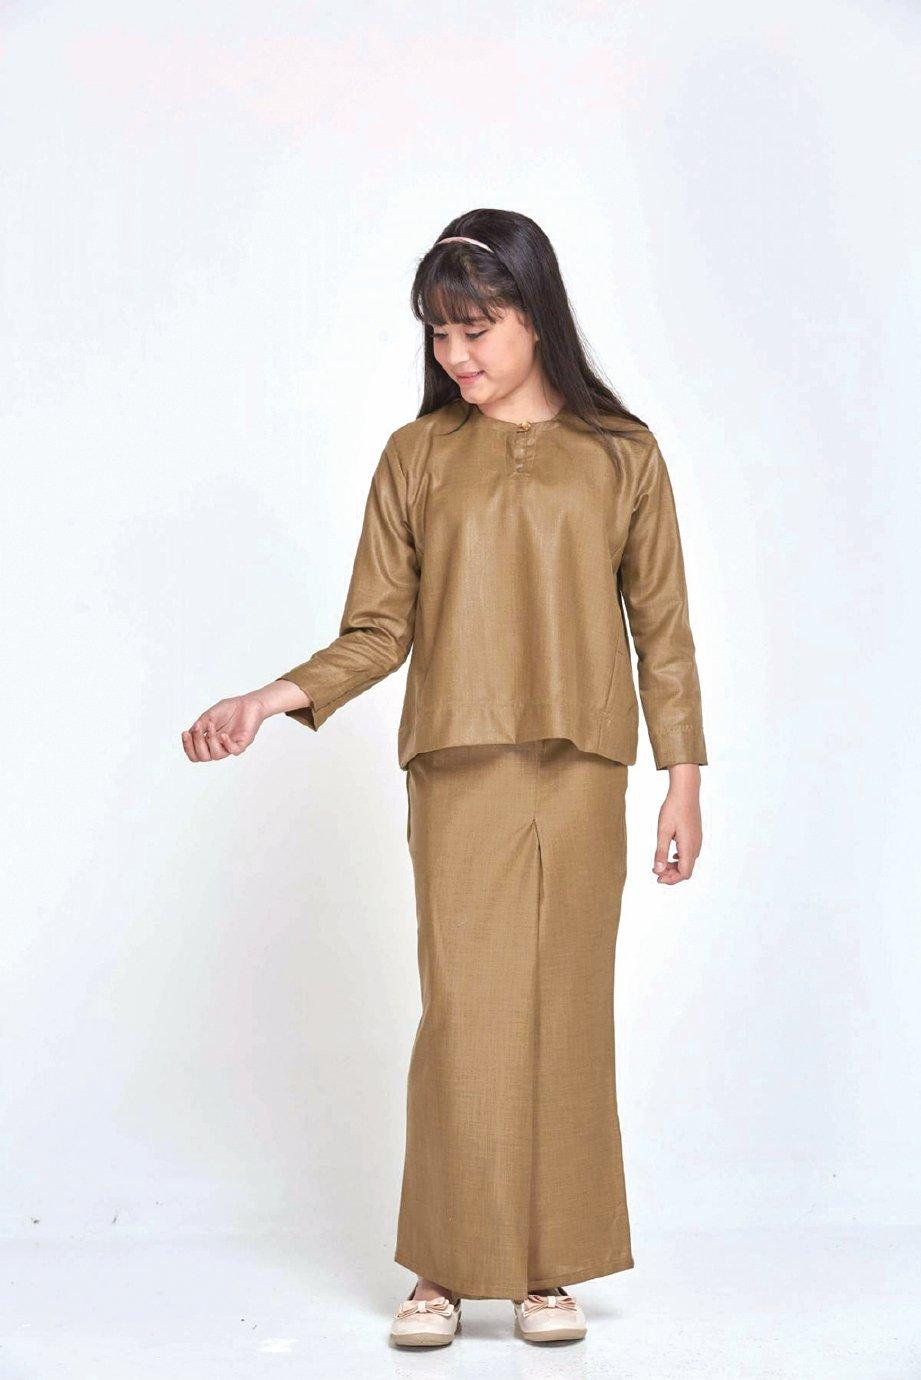 GABUNGAN dua potongan baju. FOTO Ihsan Gio Fabric, Ammar Amran & motherchild.com.my